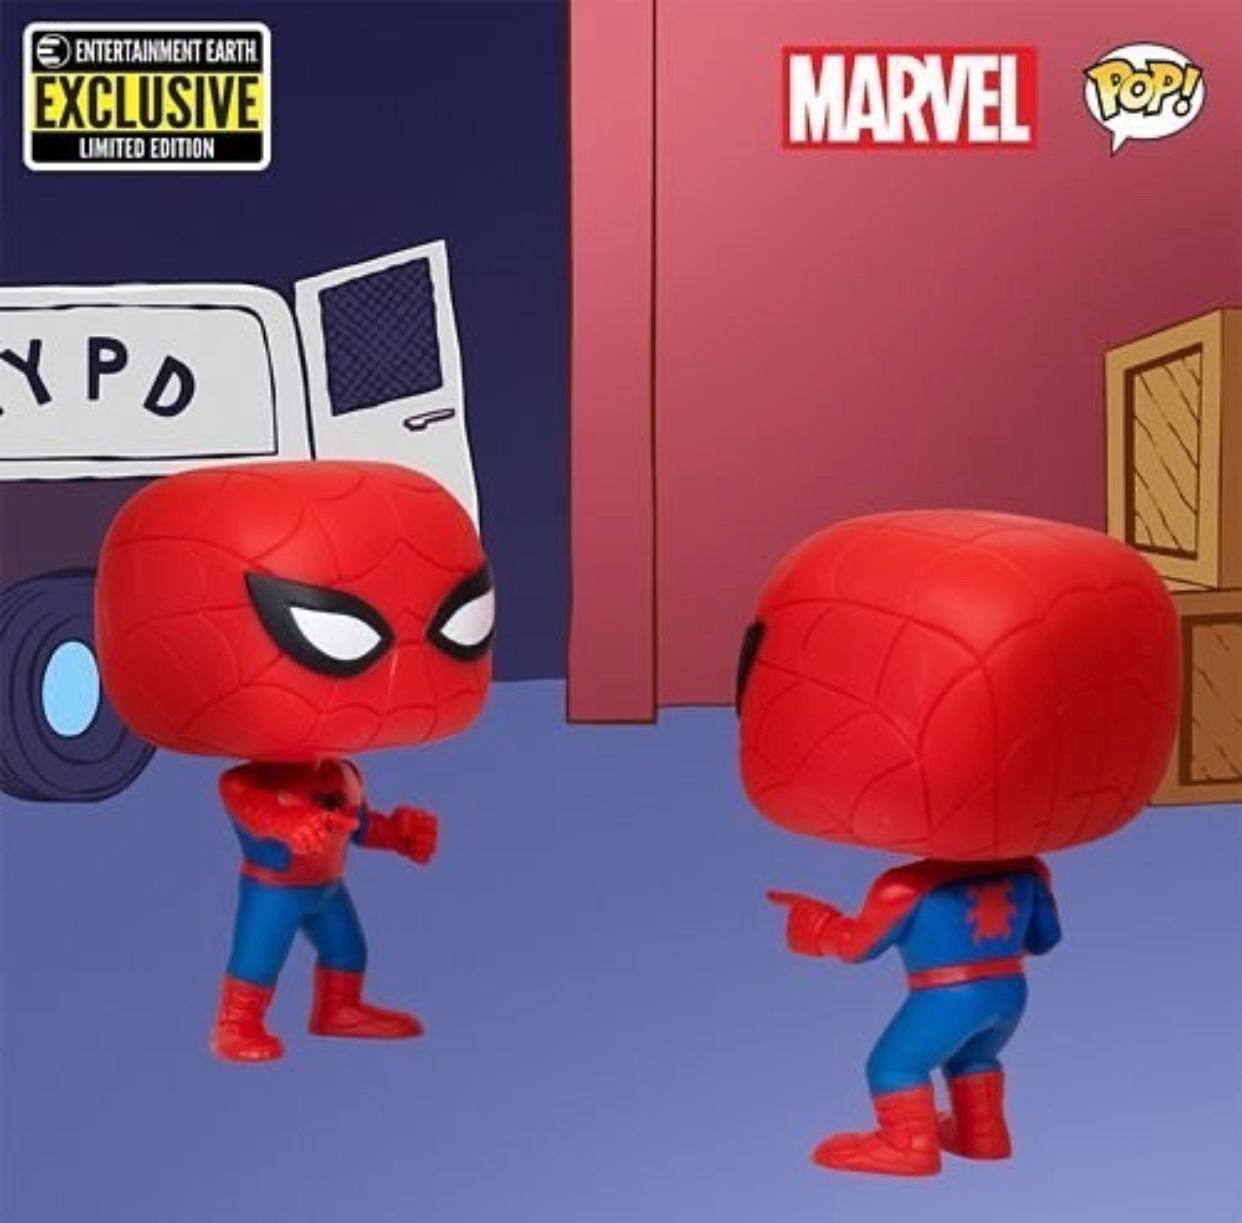 Funko Pop! Homem Aranha Vs Homem Aranha (Spider-Man Vs Spider-Man) Marvel #02 - Funko